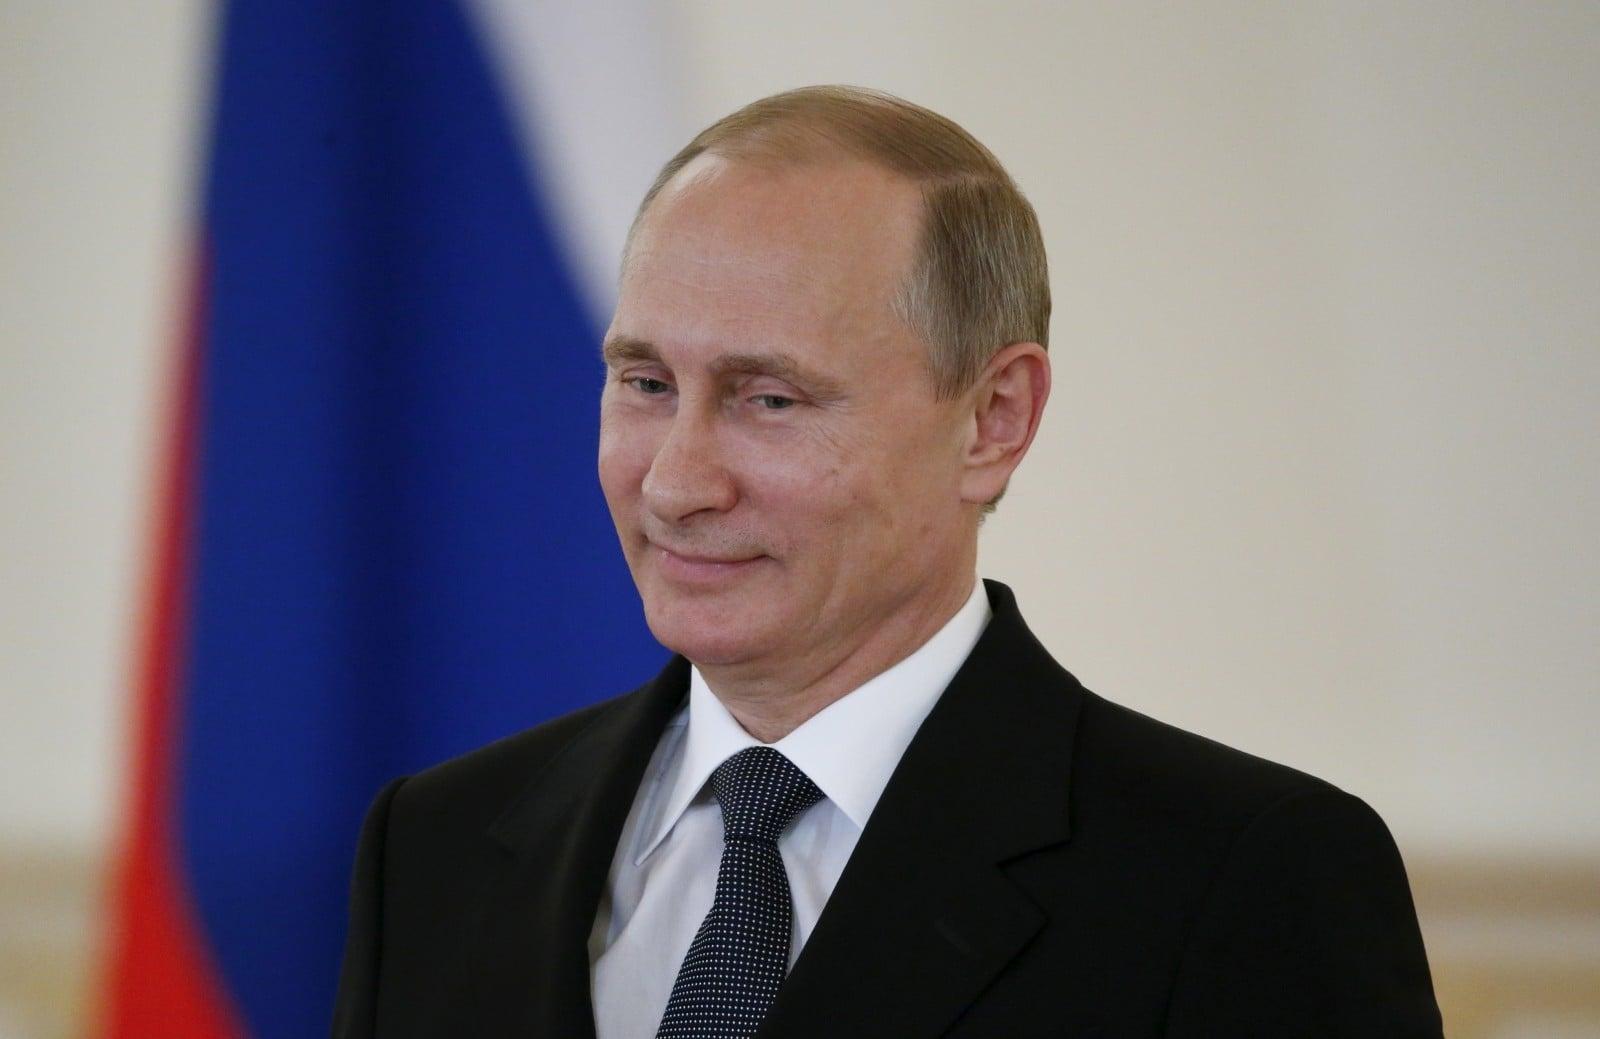 Russian President H.E. Vladimir Putin